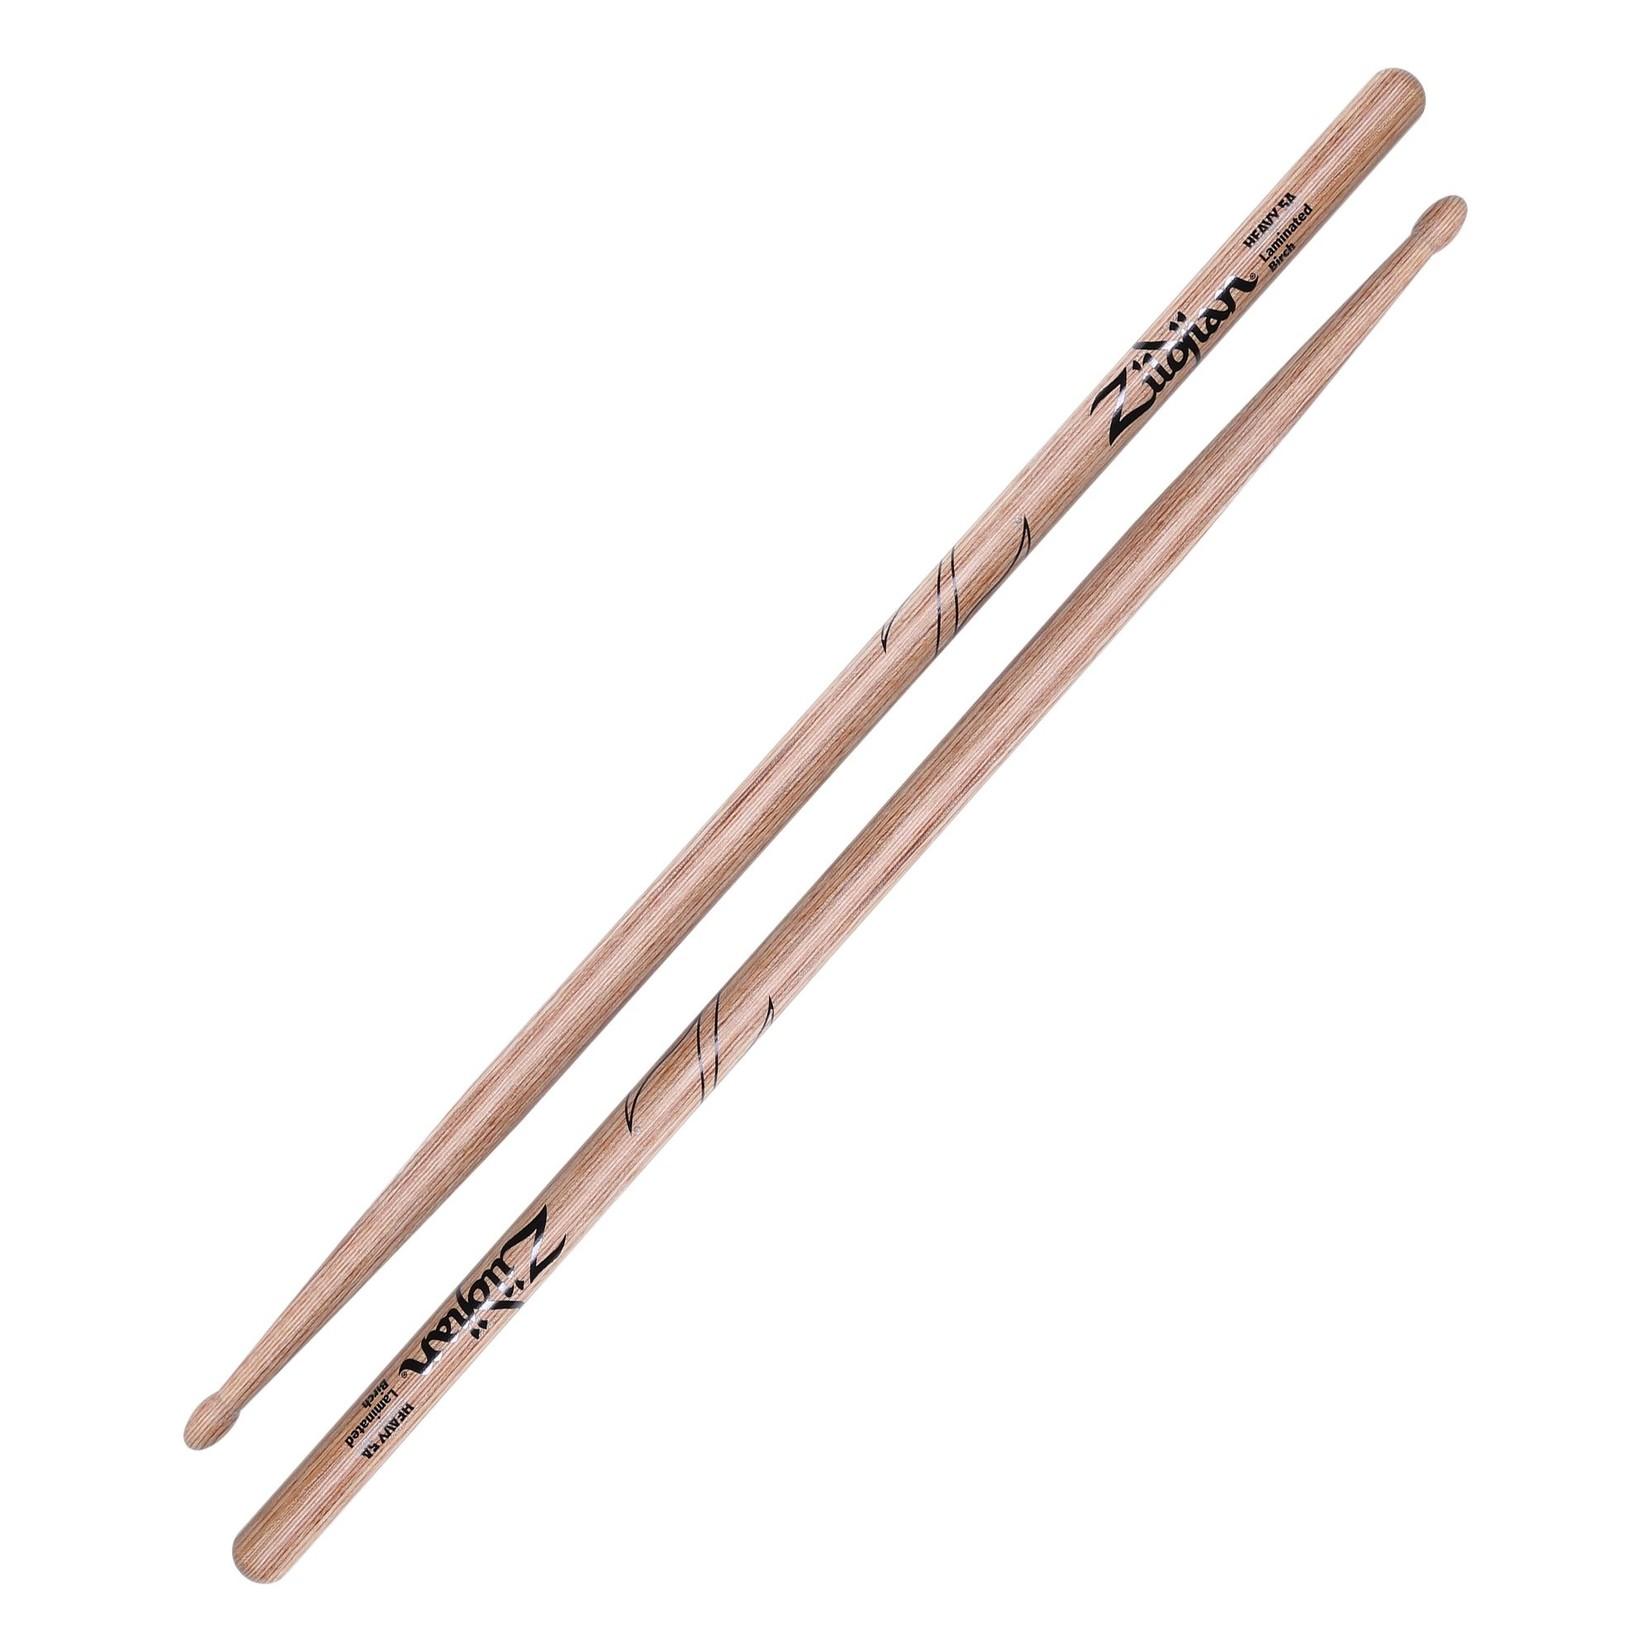 Zildjian Zildjian Heavy 5A Laminated Birch Drumsticks